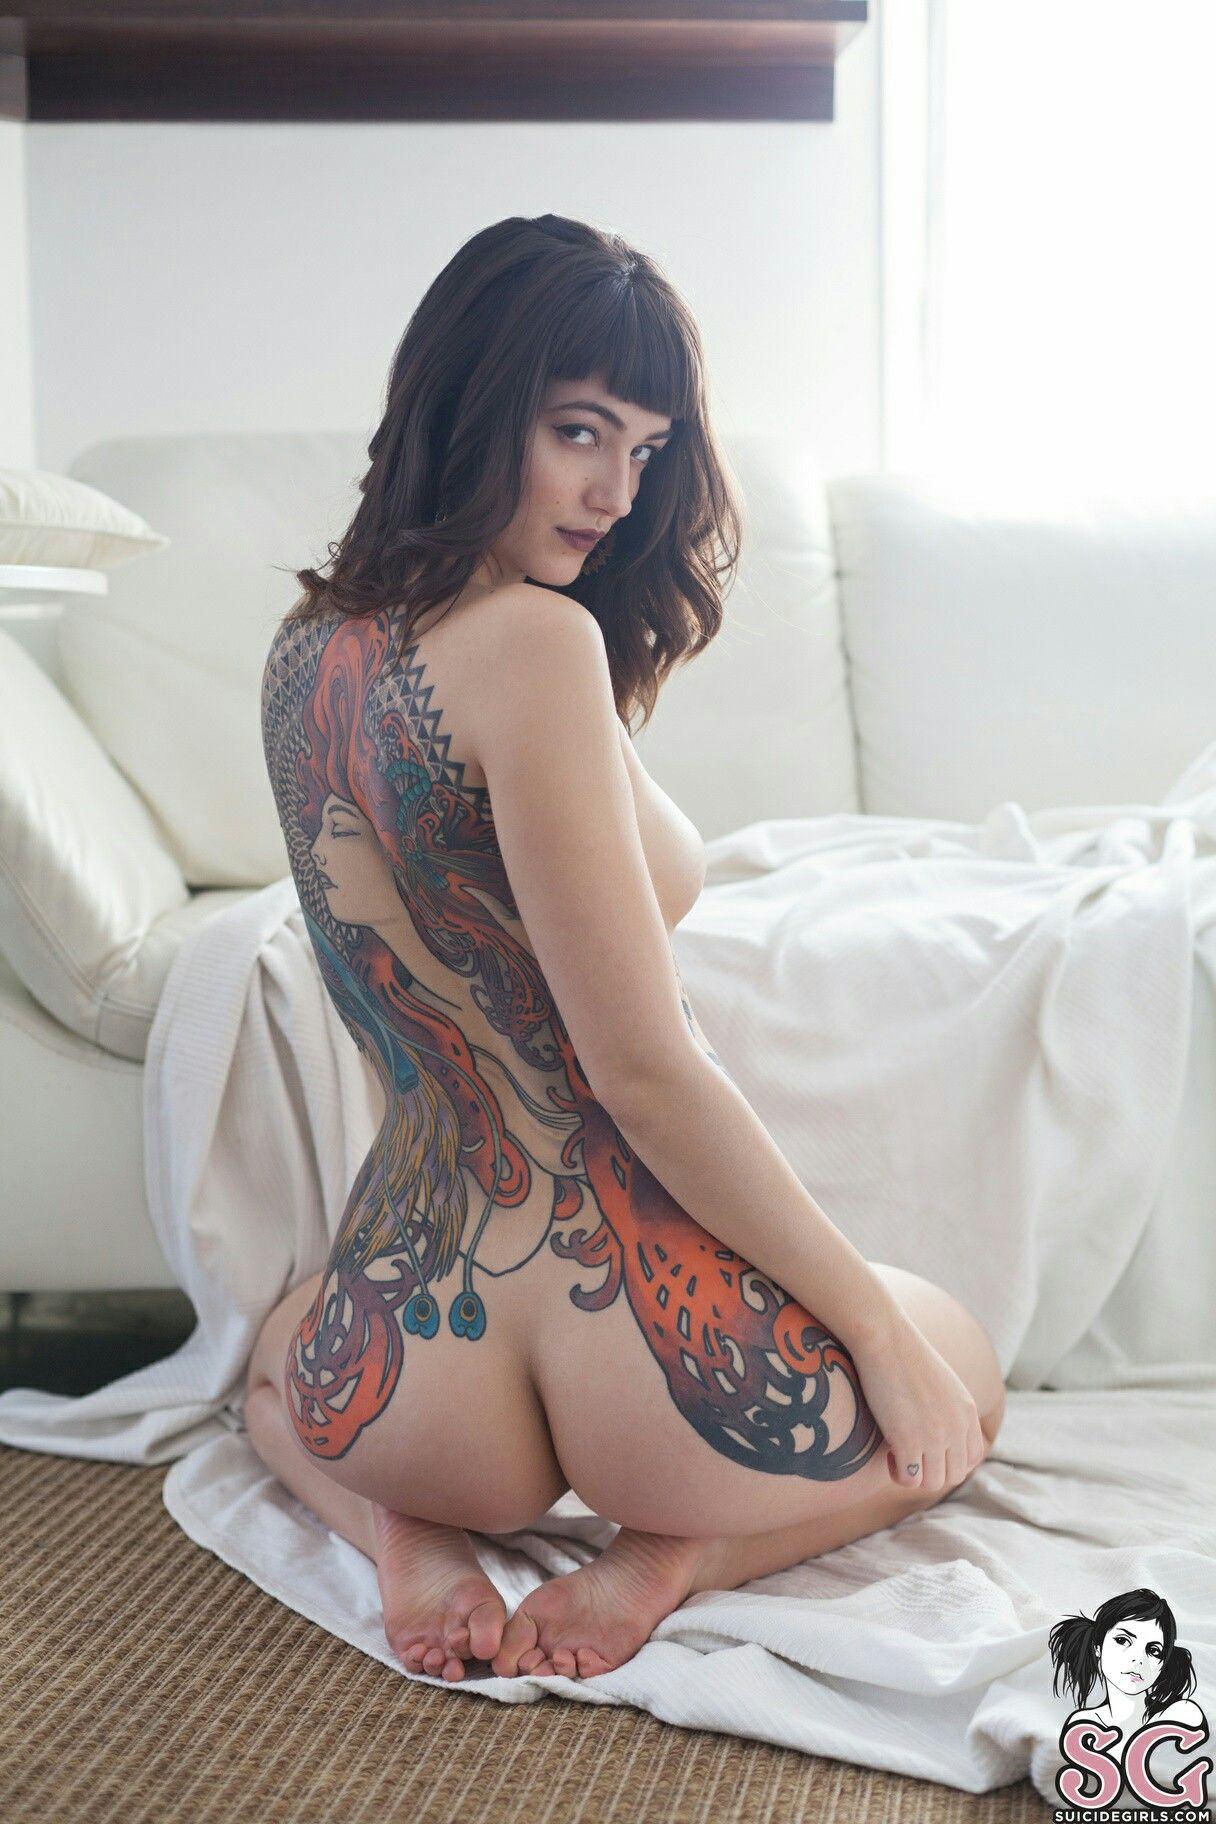 Body Art Tattoos Girl Tattoos Tattoo Girls Tatoos Tattoos For Women